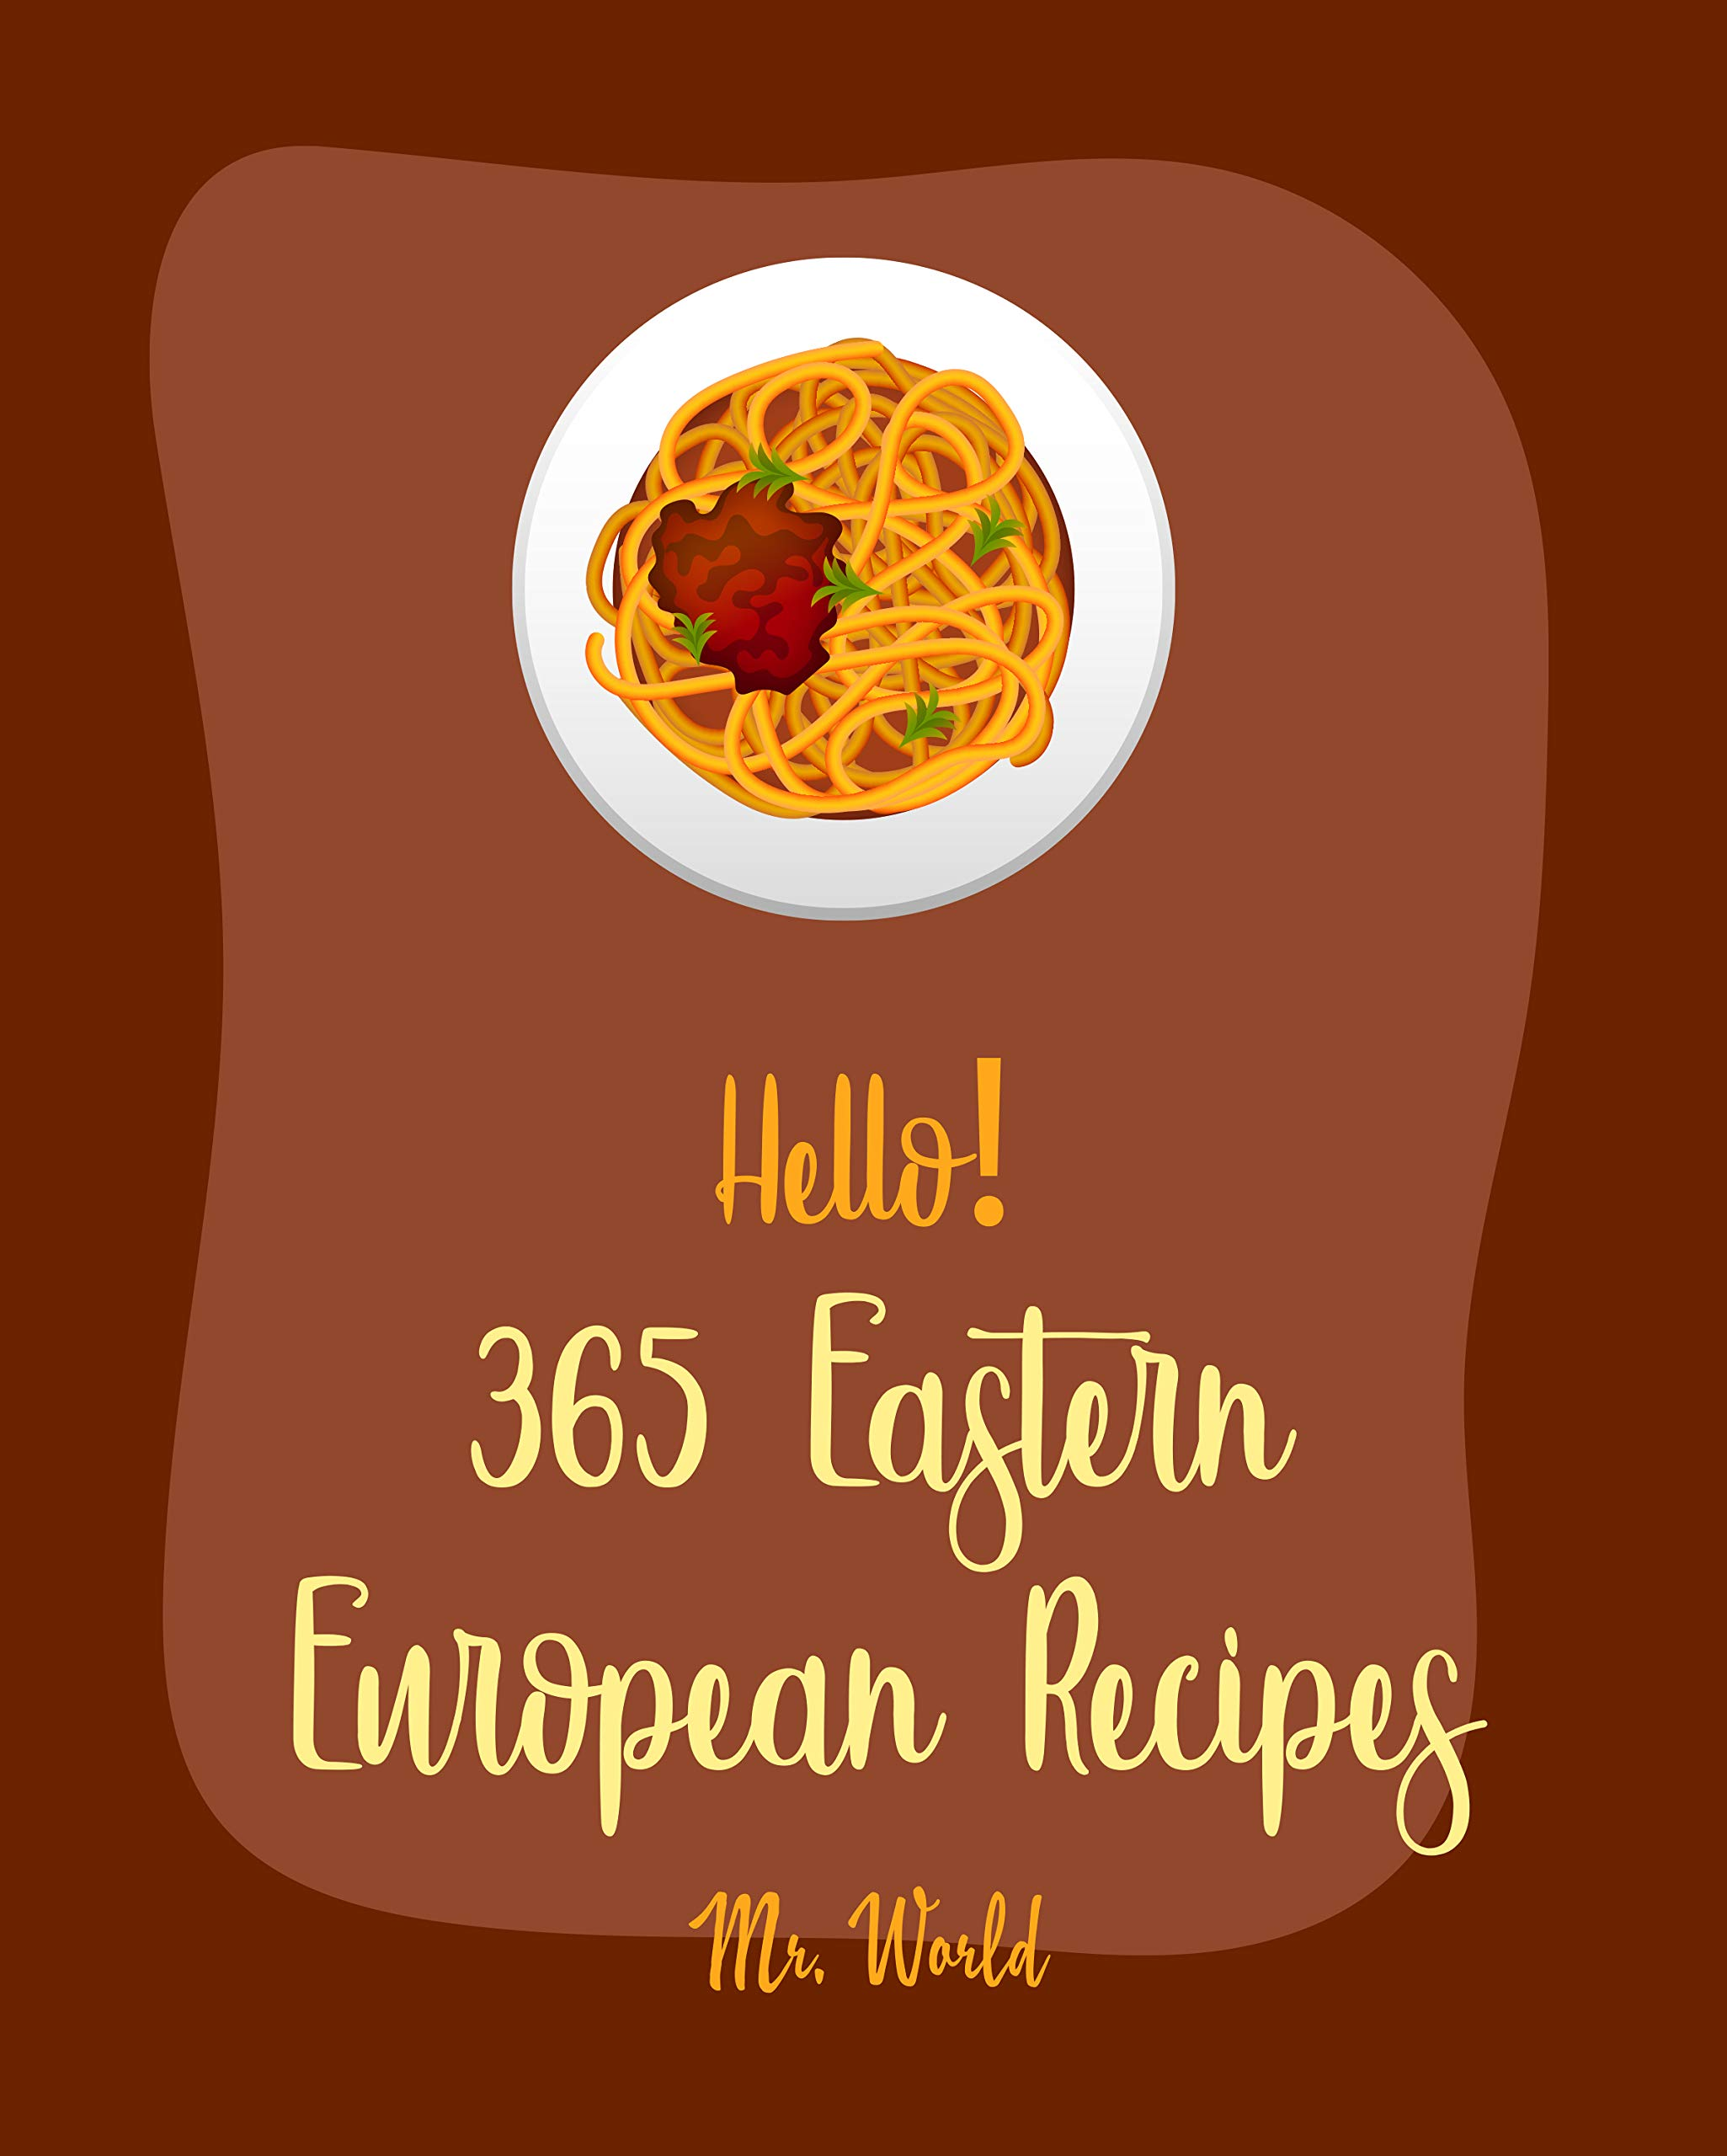 Hello! 365 Eastern European Recipes: Best Eastern European Cookbook Ever For Beginners [Polish Cookbook, Hungarian Recipes, Russian Recipes Cookbook, Egg ... Recipe, Beef Stroganoff Recipe] [Book 1]